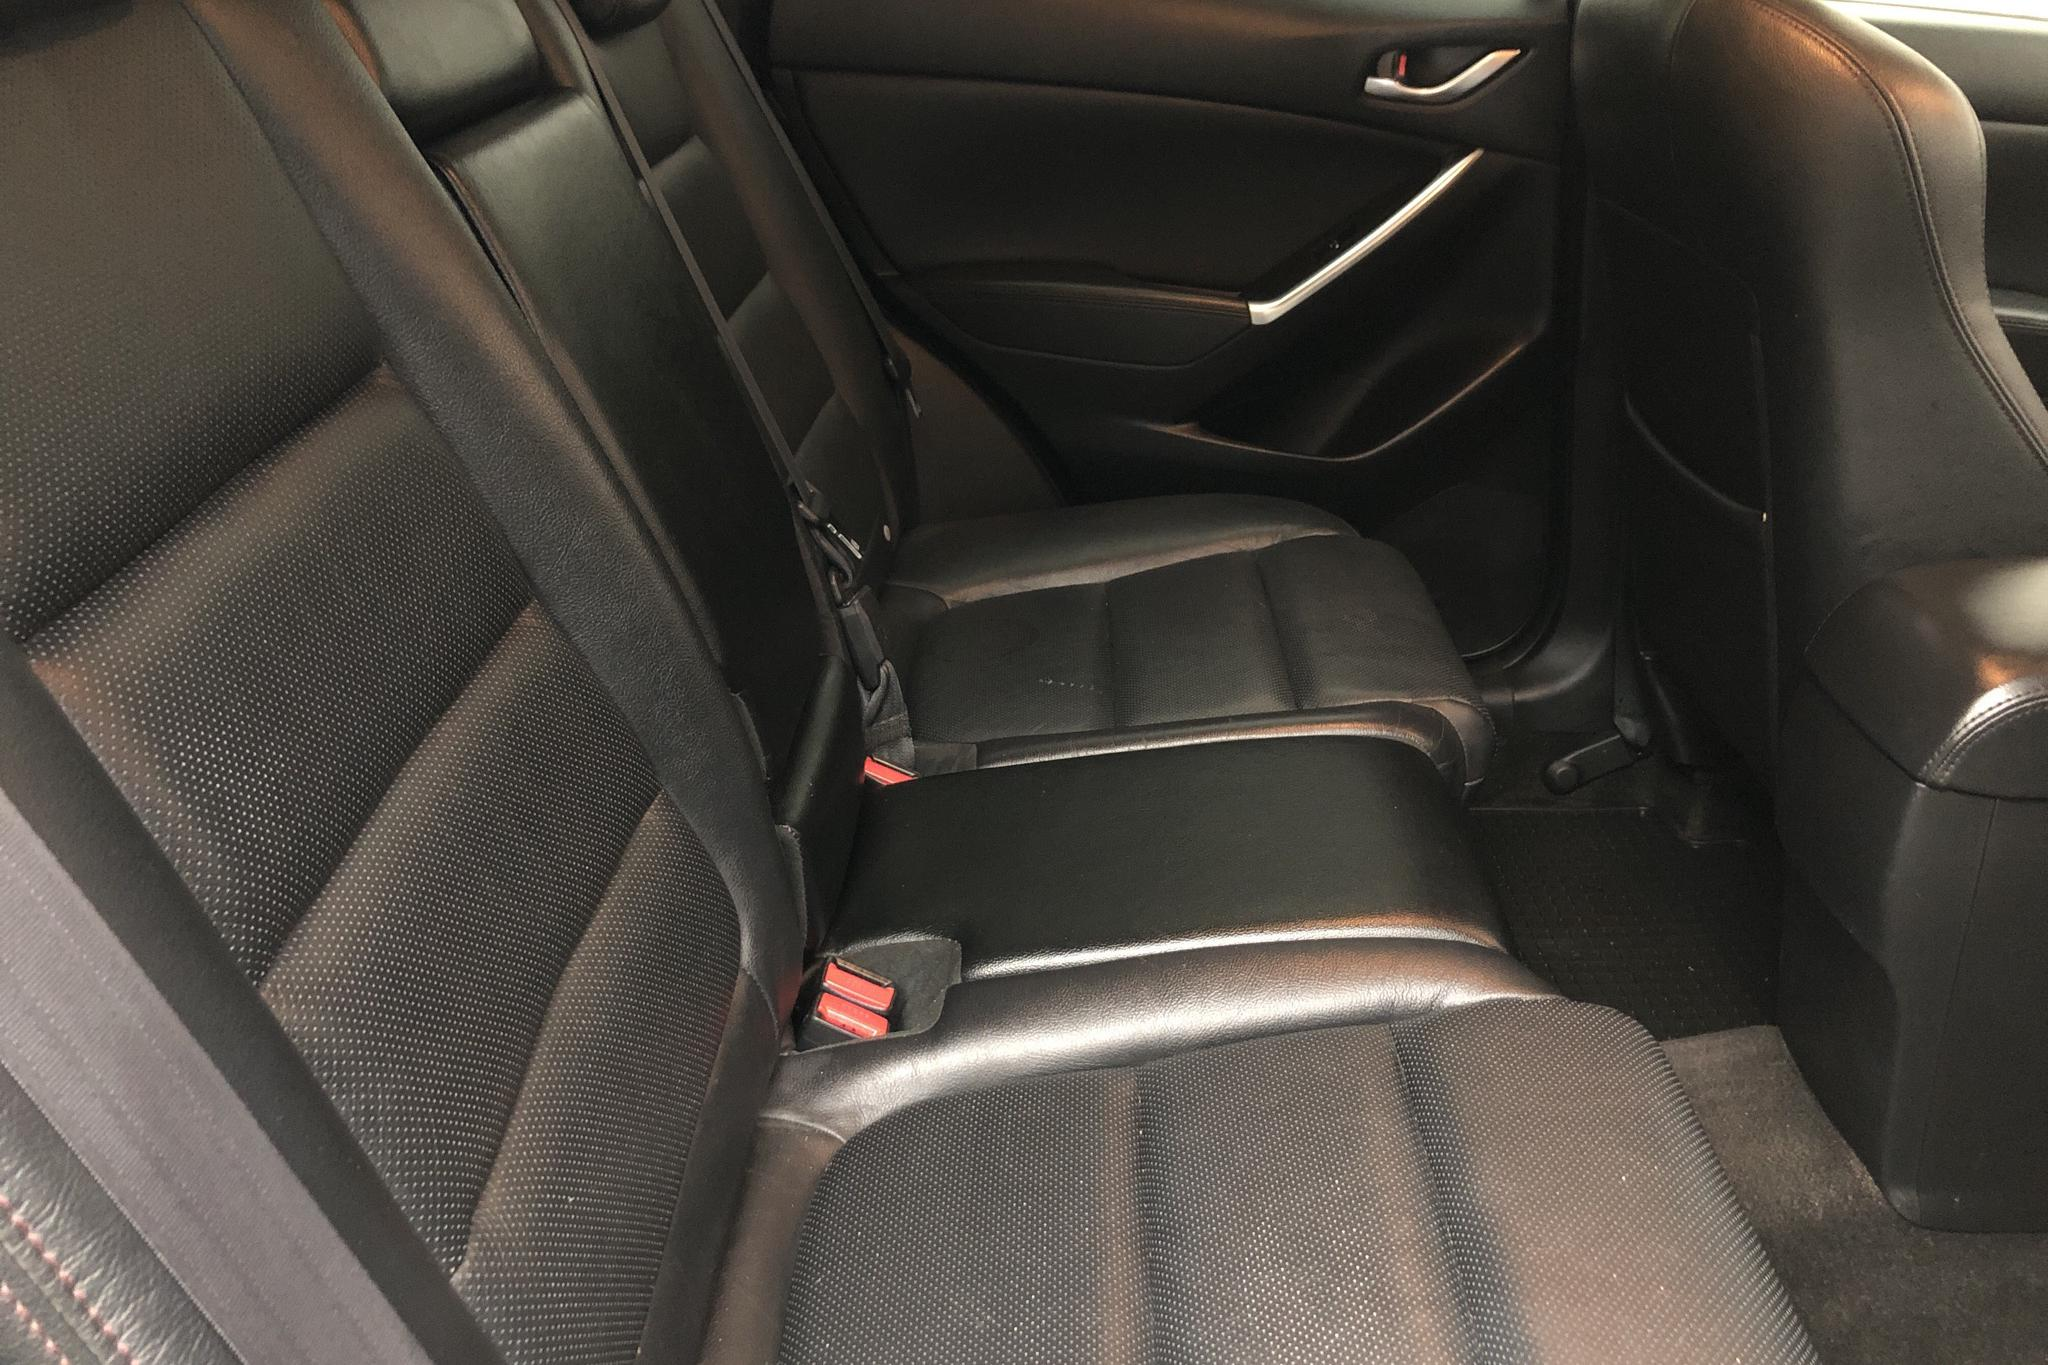 mazda CX-5 2.2 DE AWD (175hk) - 12 583 mil - Automat - vit - 2016